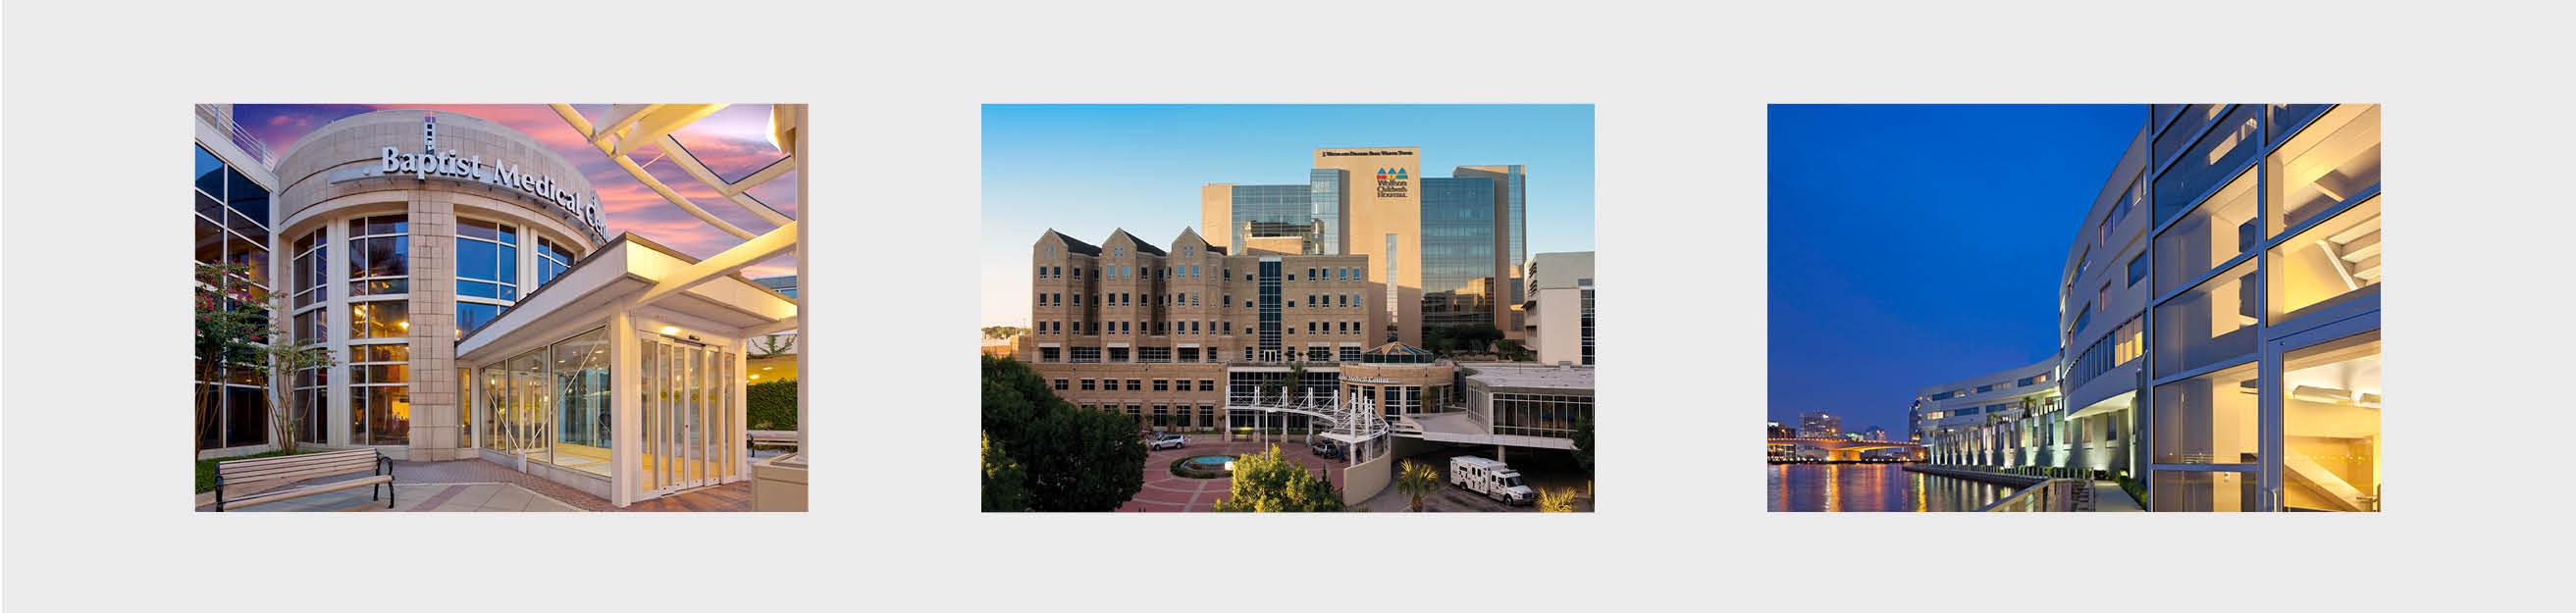 Baptist Medical Center 2